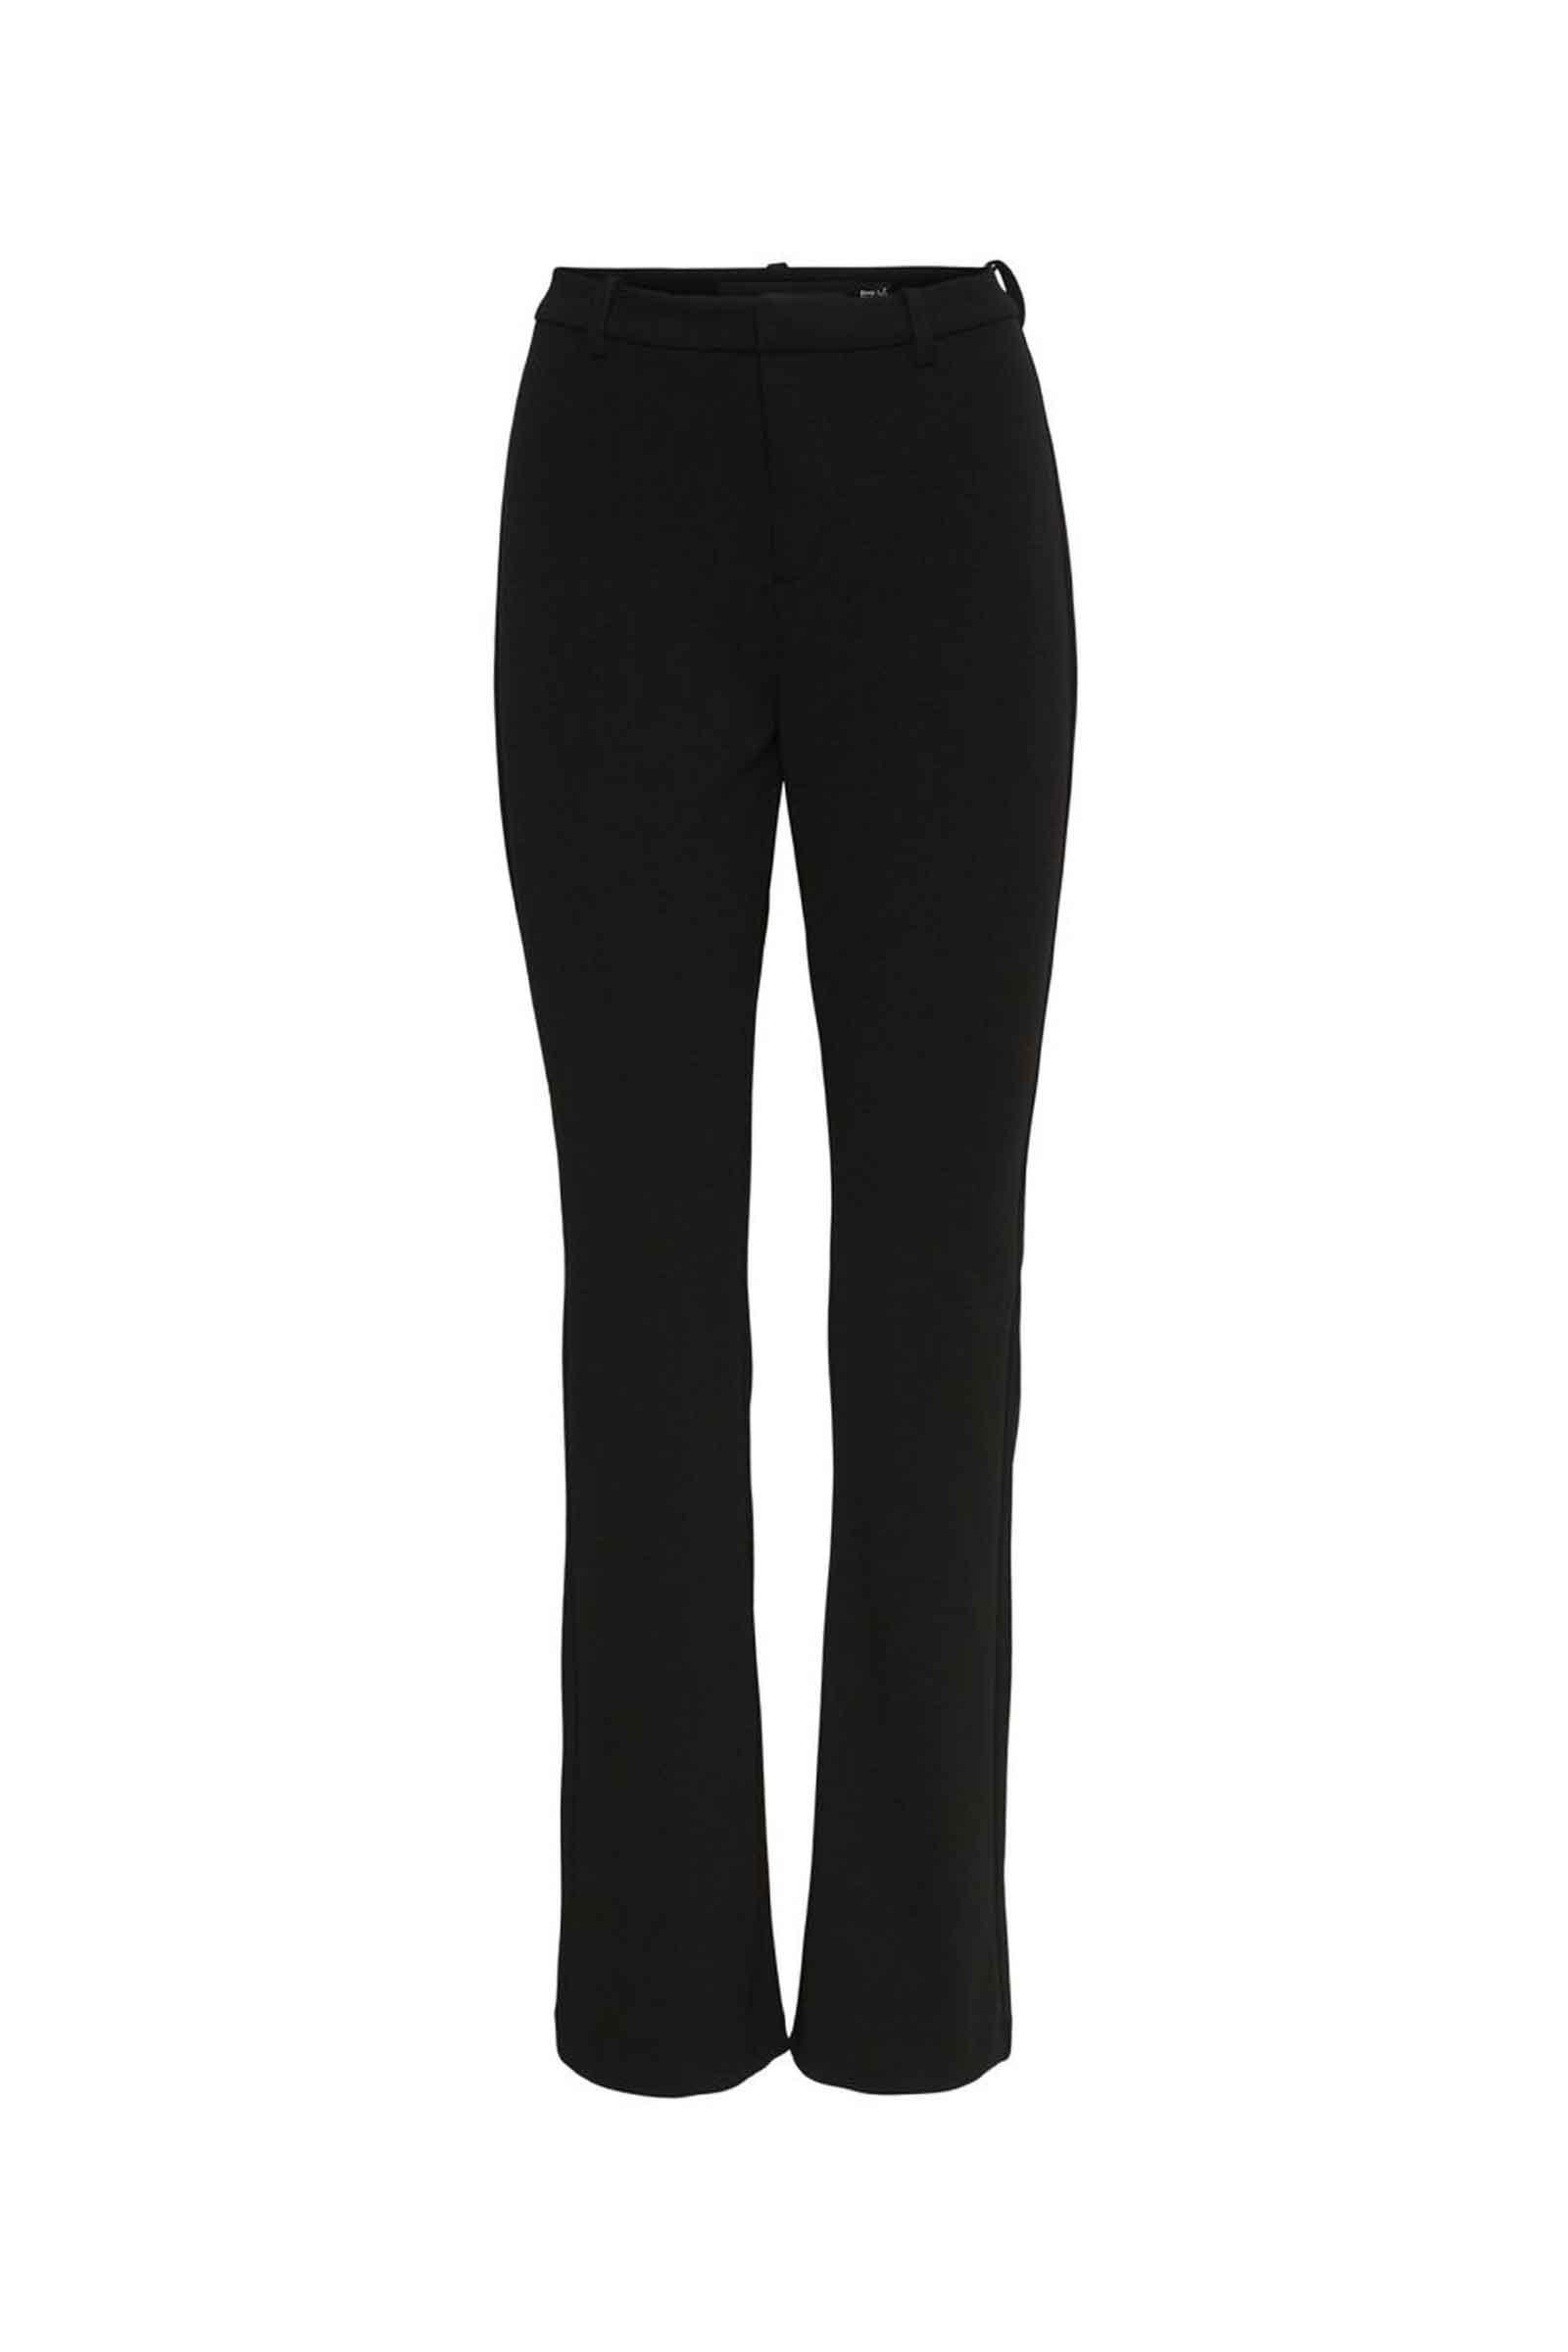 Woman Trousers VERO MODA | Trousers | 10250284Black